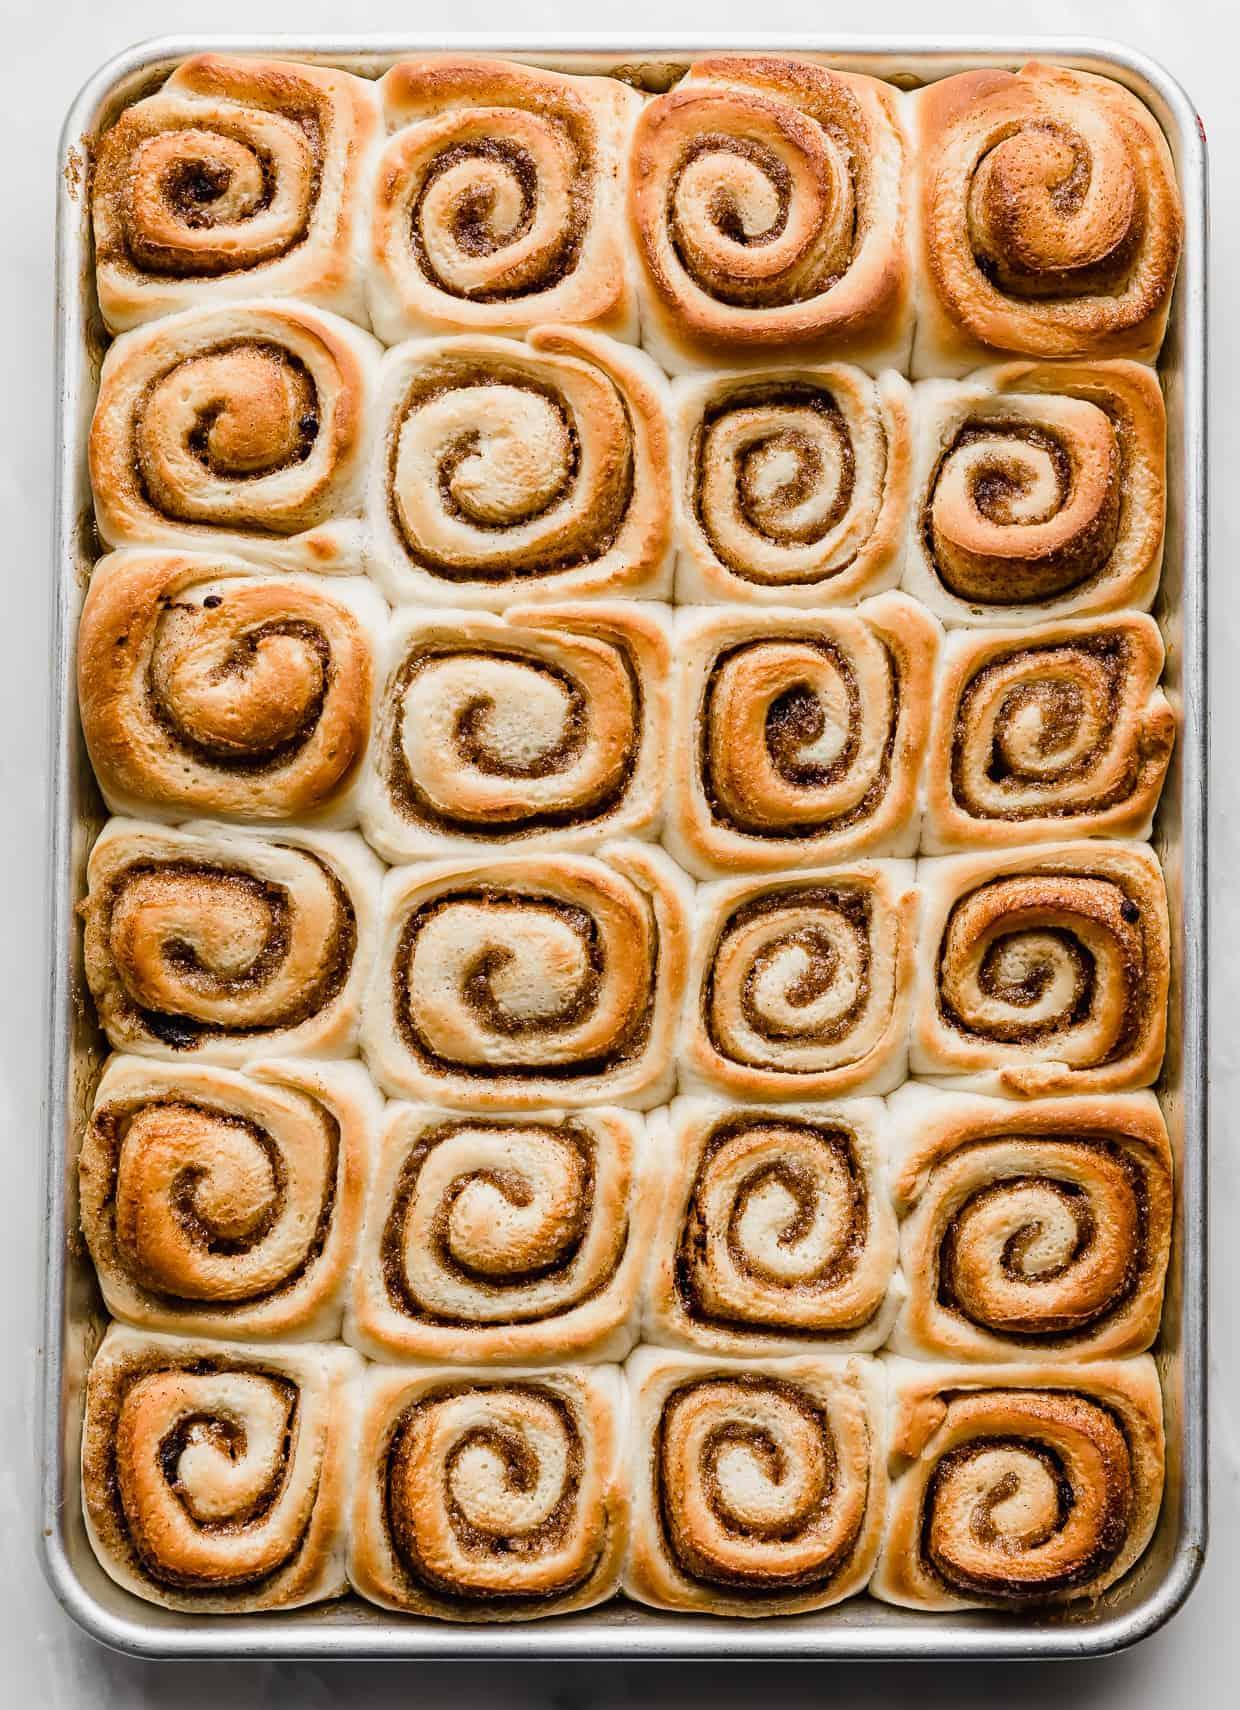 Golden brown baked mini cinnamon rolls on a baking sheet.